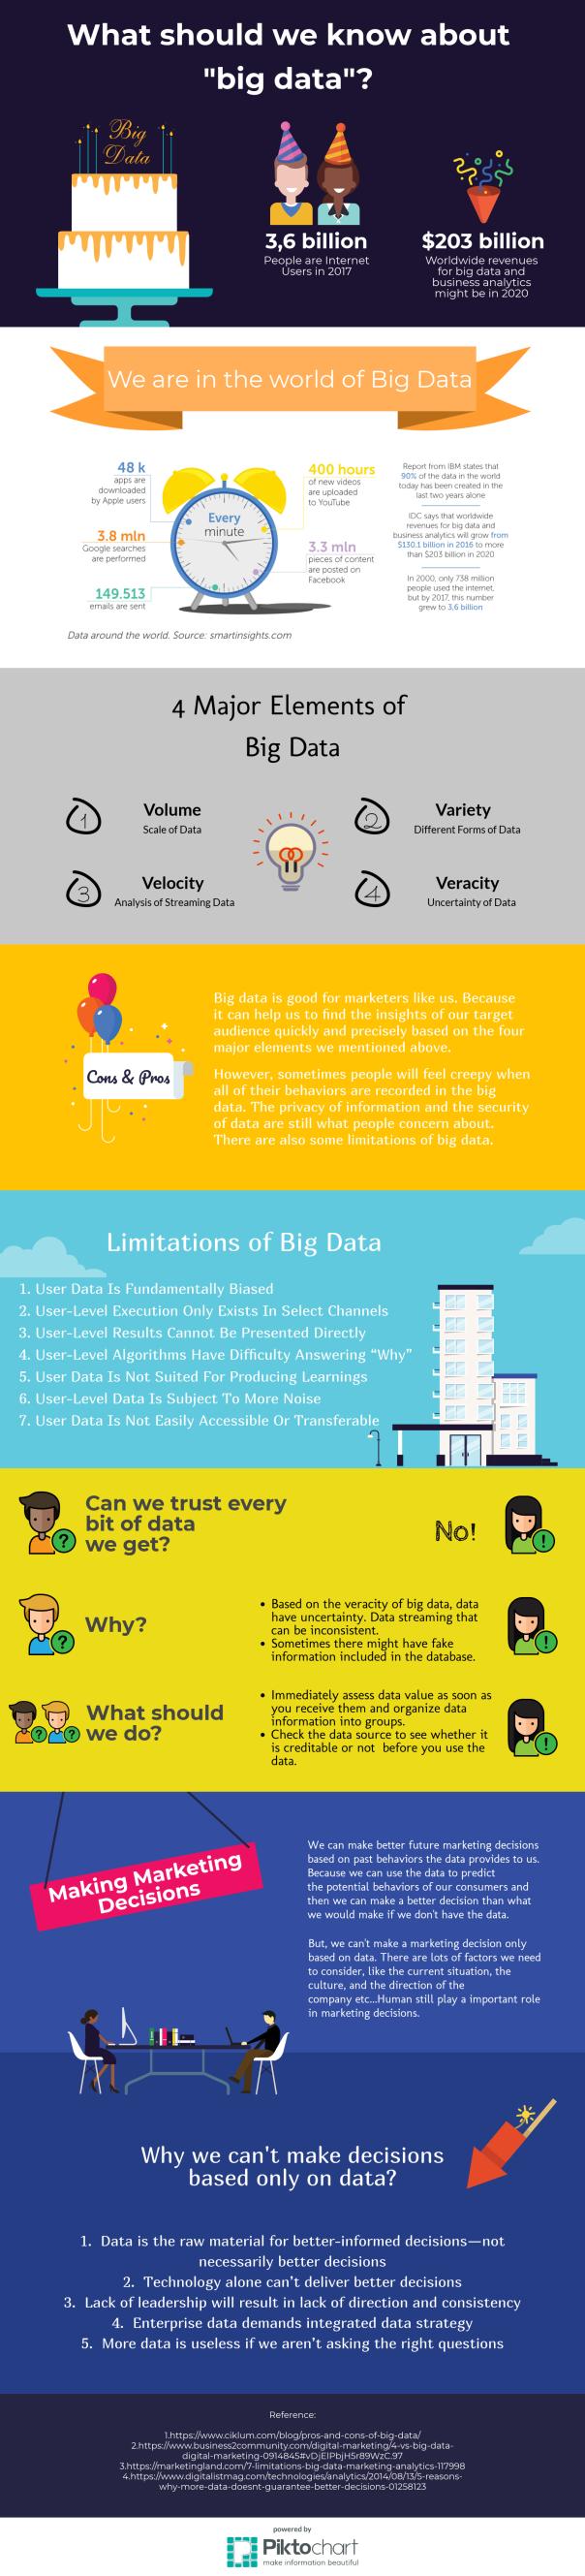 big-data_26402843